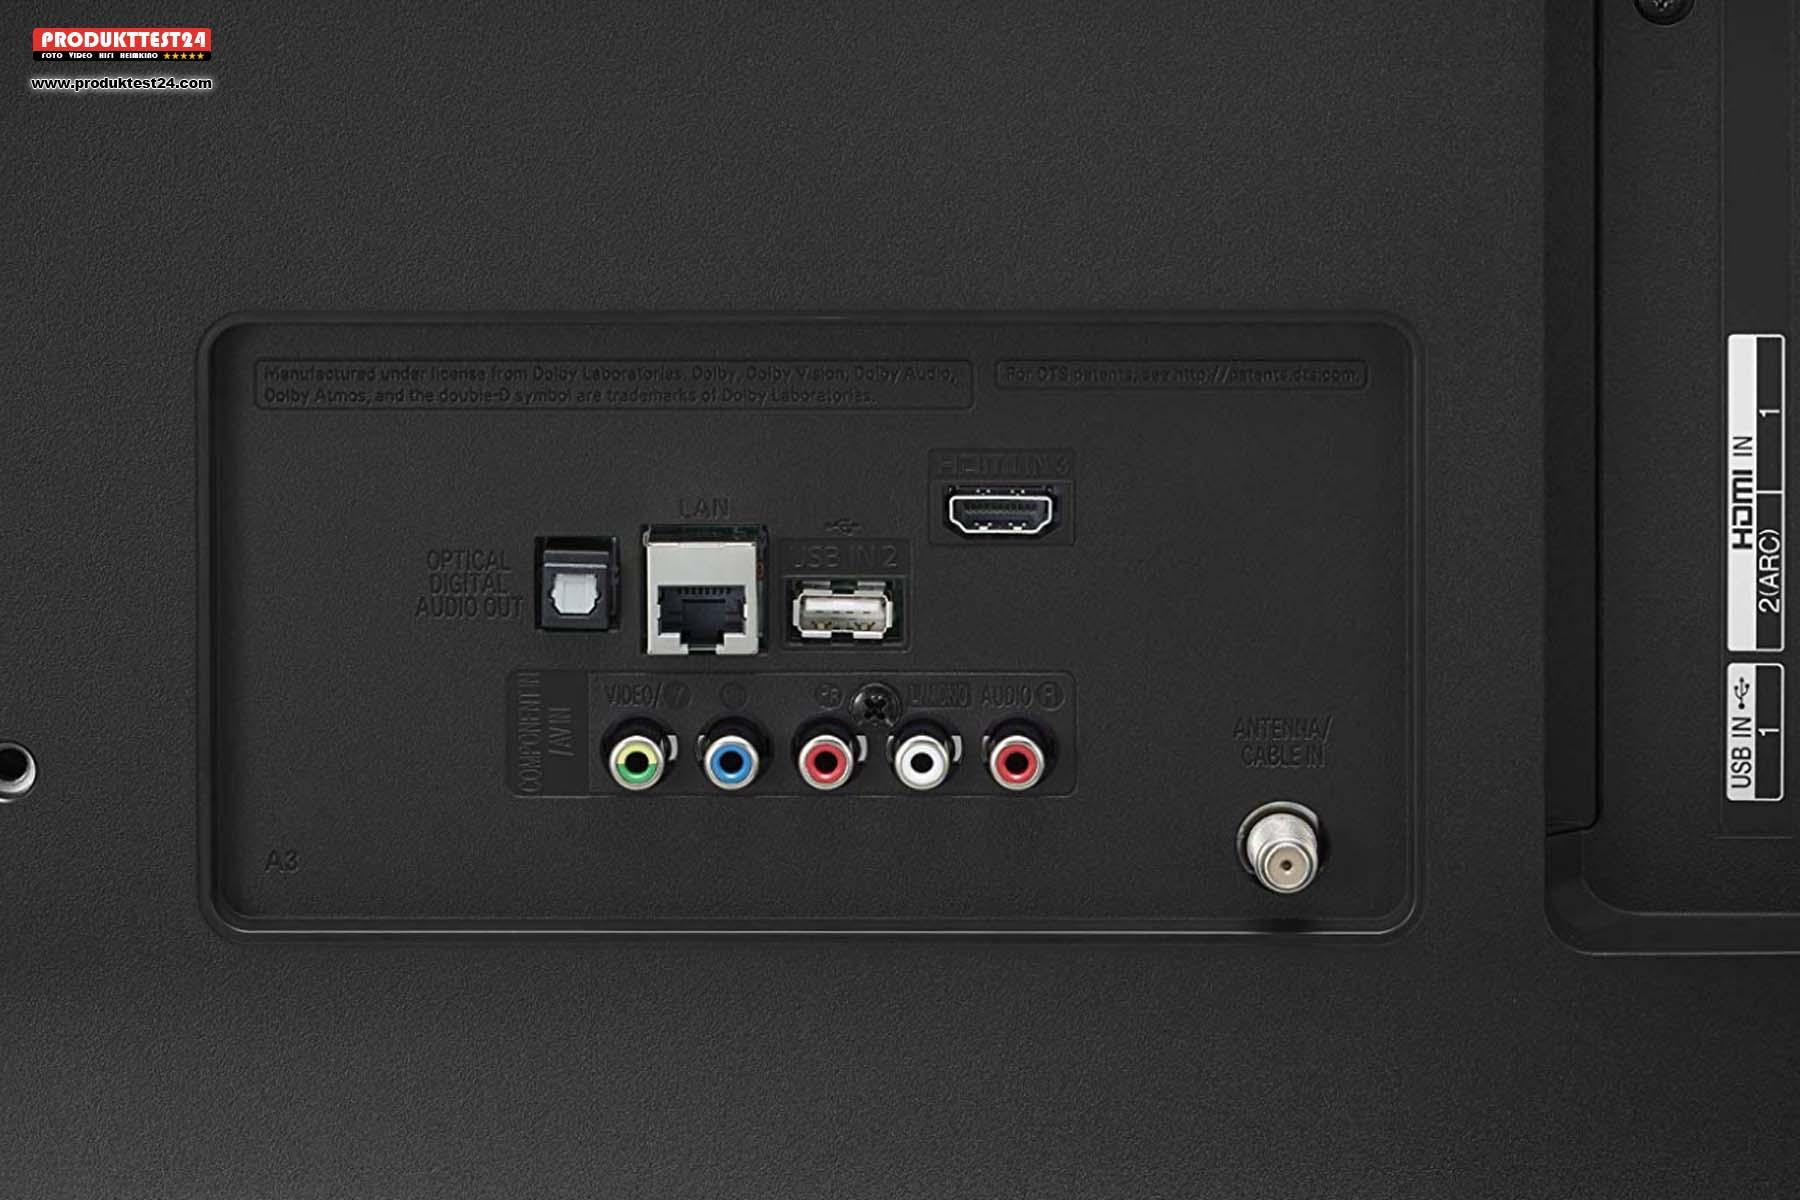 3x HDMI, 2x USB, 1x Optisch, 1x Analog AV, 1x LAN, 1x WLAN